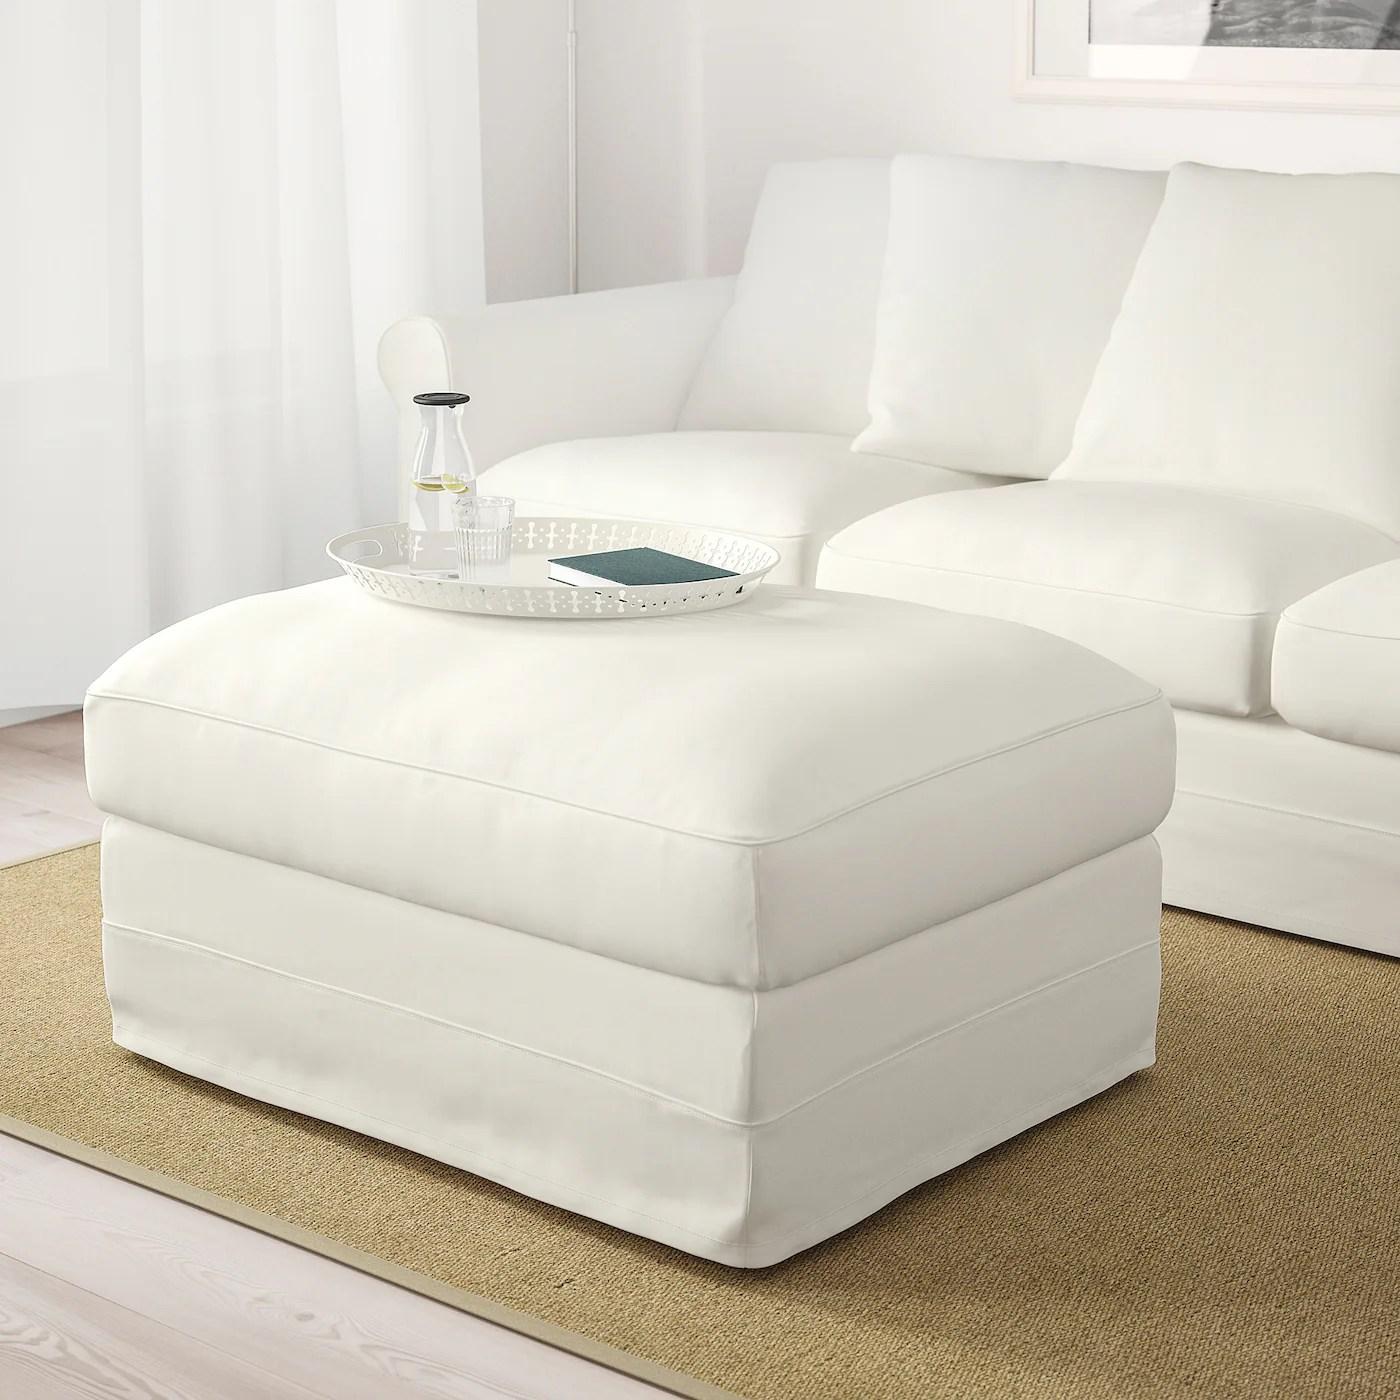 Harlanda Repose Pieds Av Rangement Inseros Blanc Magasinez Ici Ikea